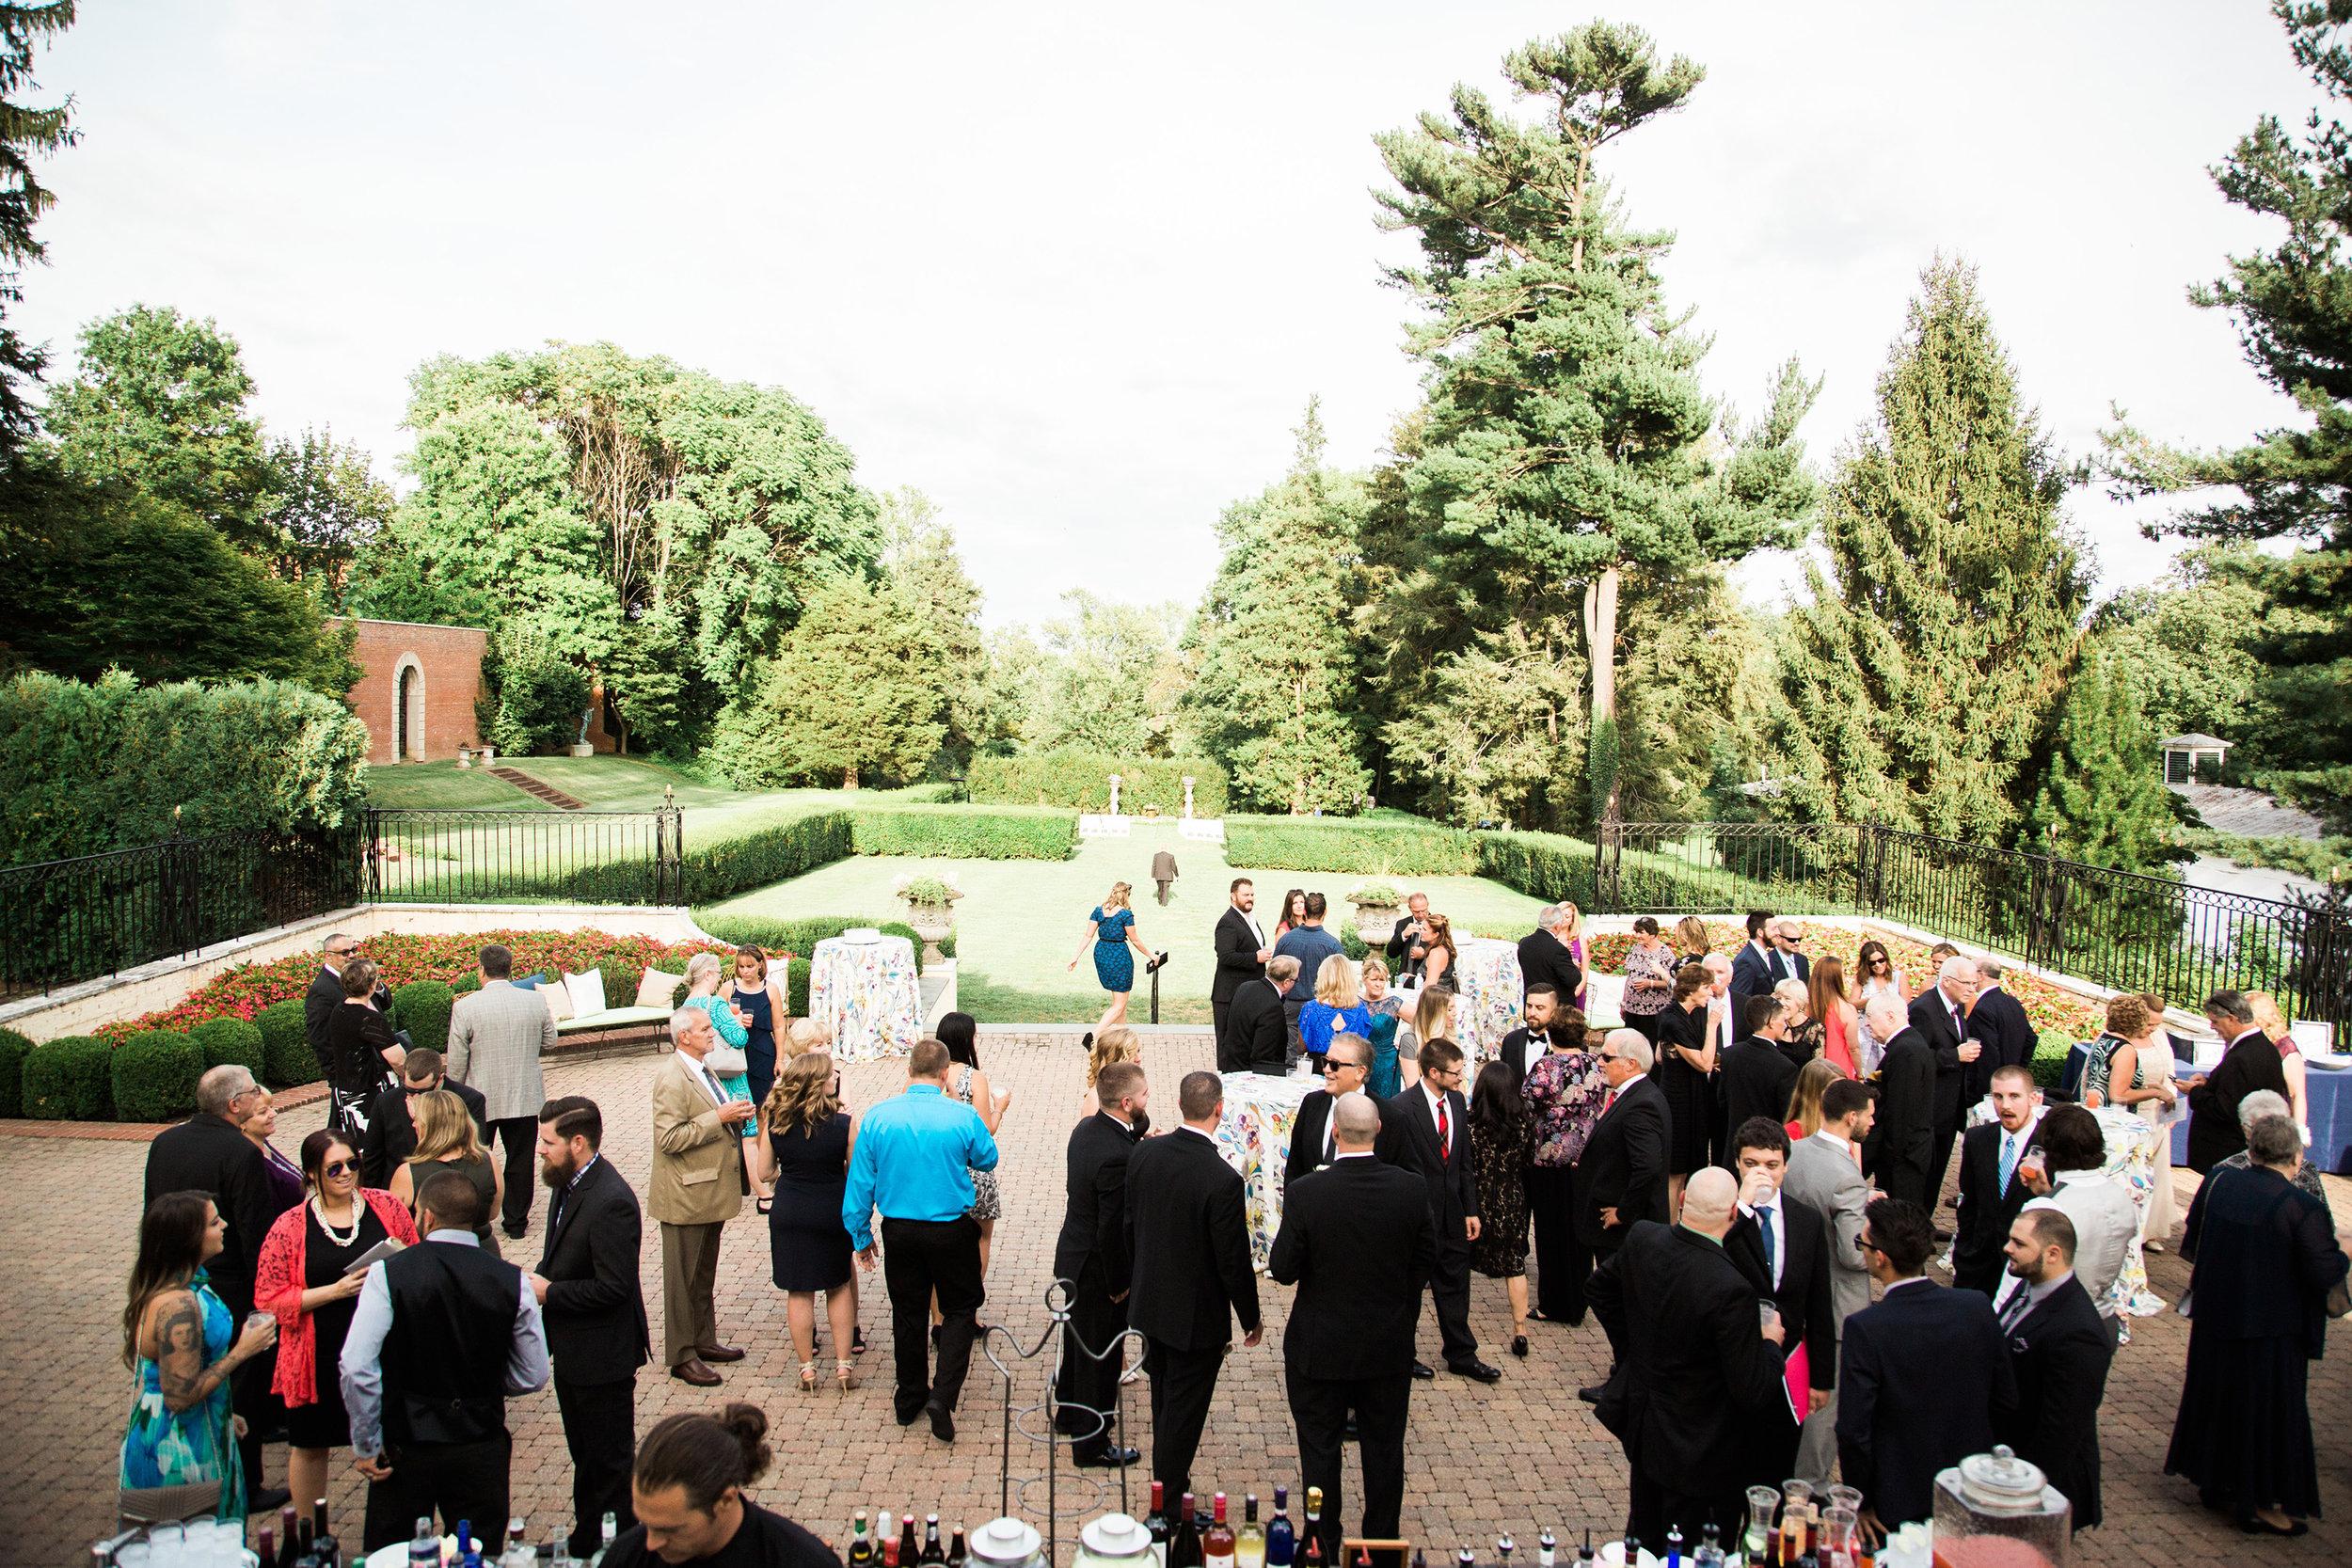 Evergreen-Museum-Balitmore-Maryland-Wedding-Black-Tie-Bride-040.jpg